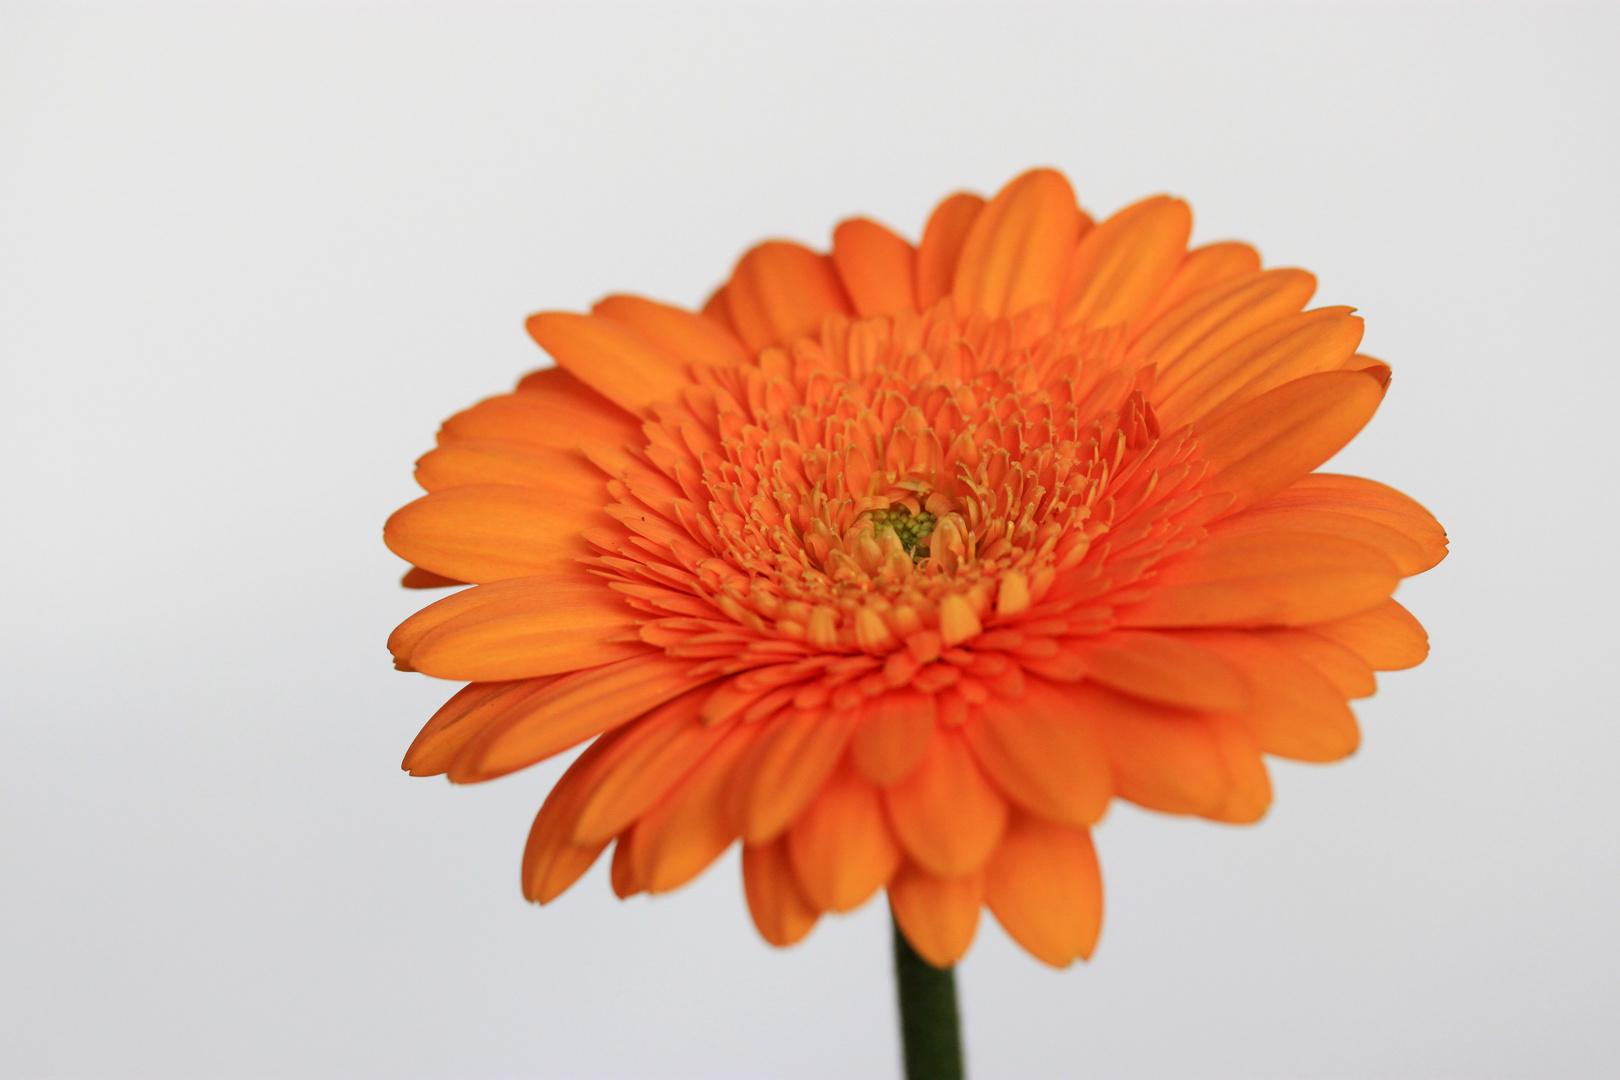 so orange.